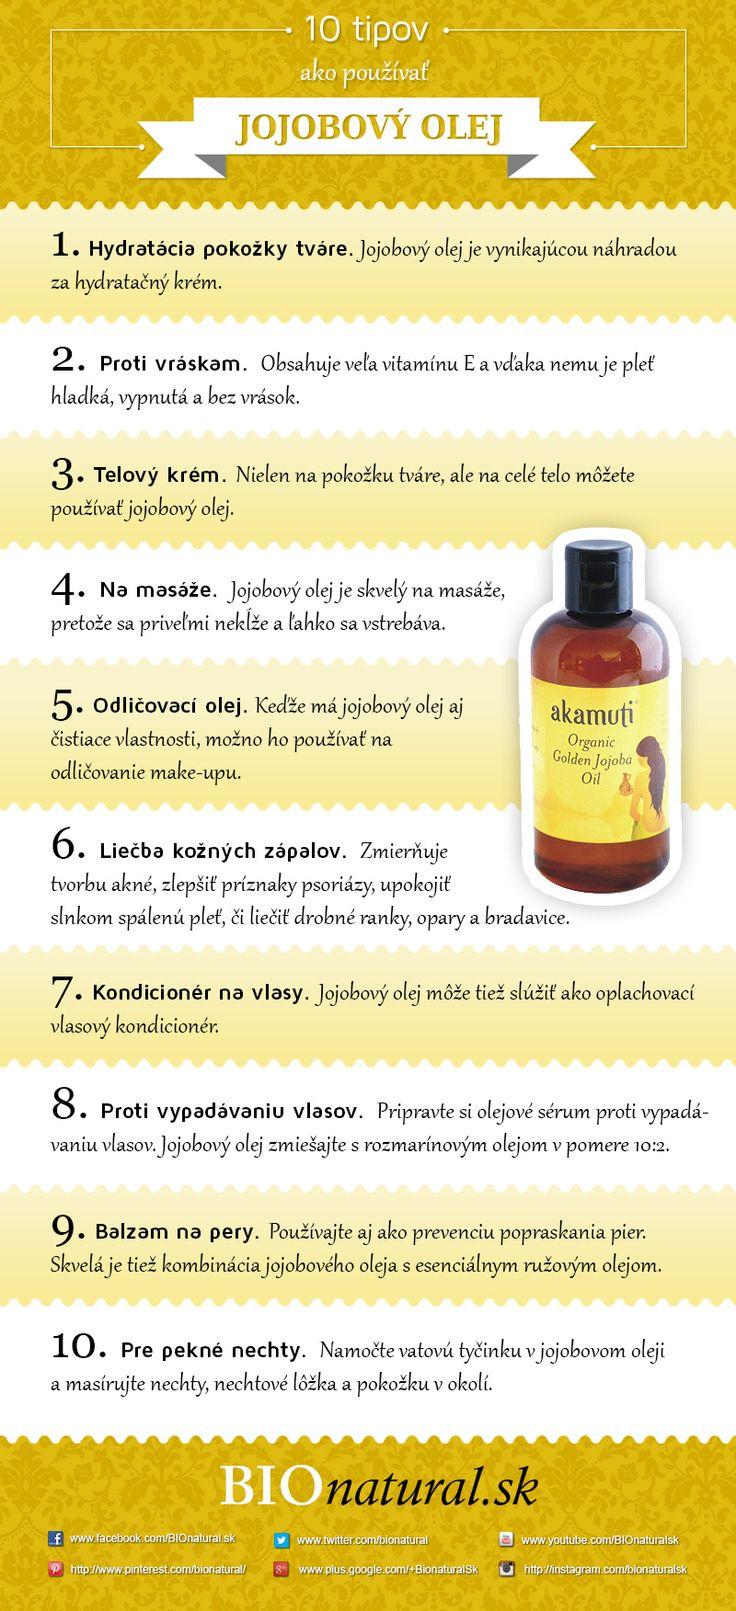 10 tipov na použitie jojobového oleja http://www.bionatural.sk/a/10-tipov-ako-pouzivat-jojobovy-olej-infografika